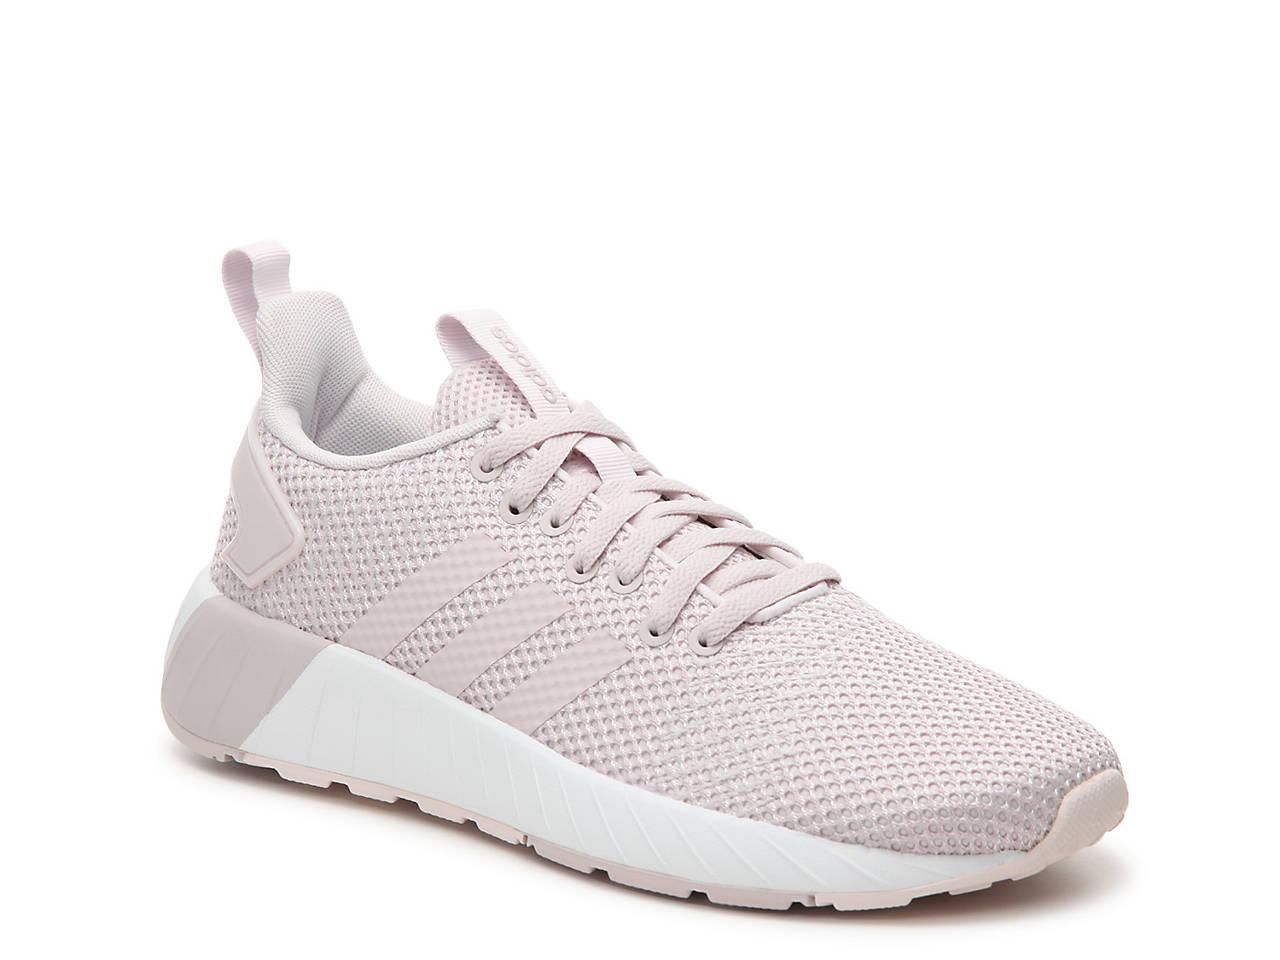 new product 5d761 2e67e scarpe adidas questar byd